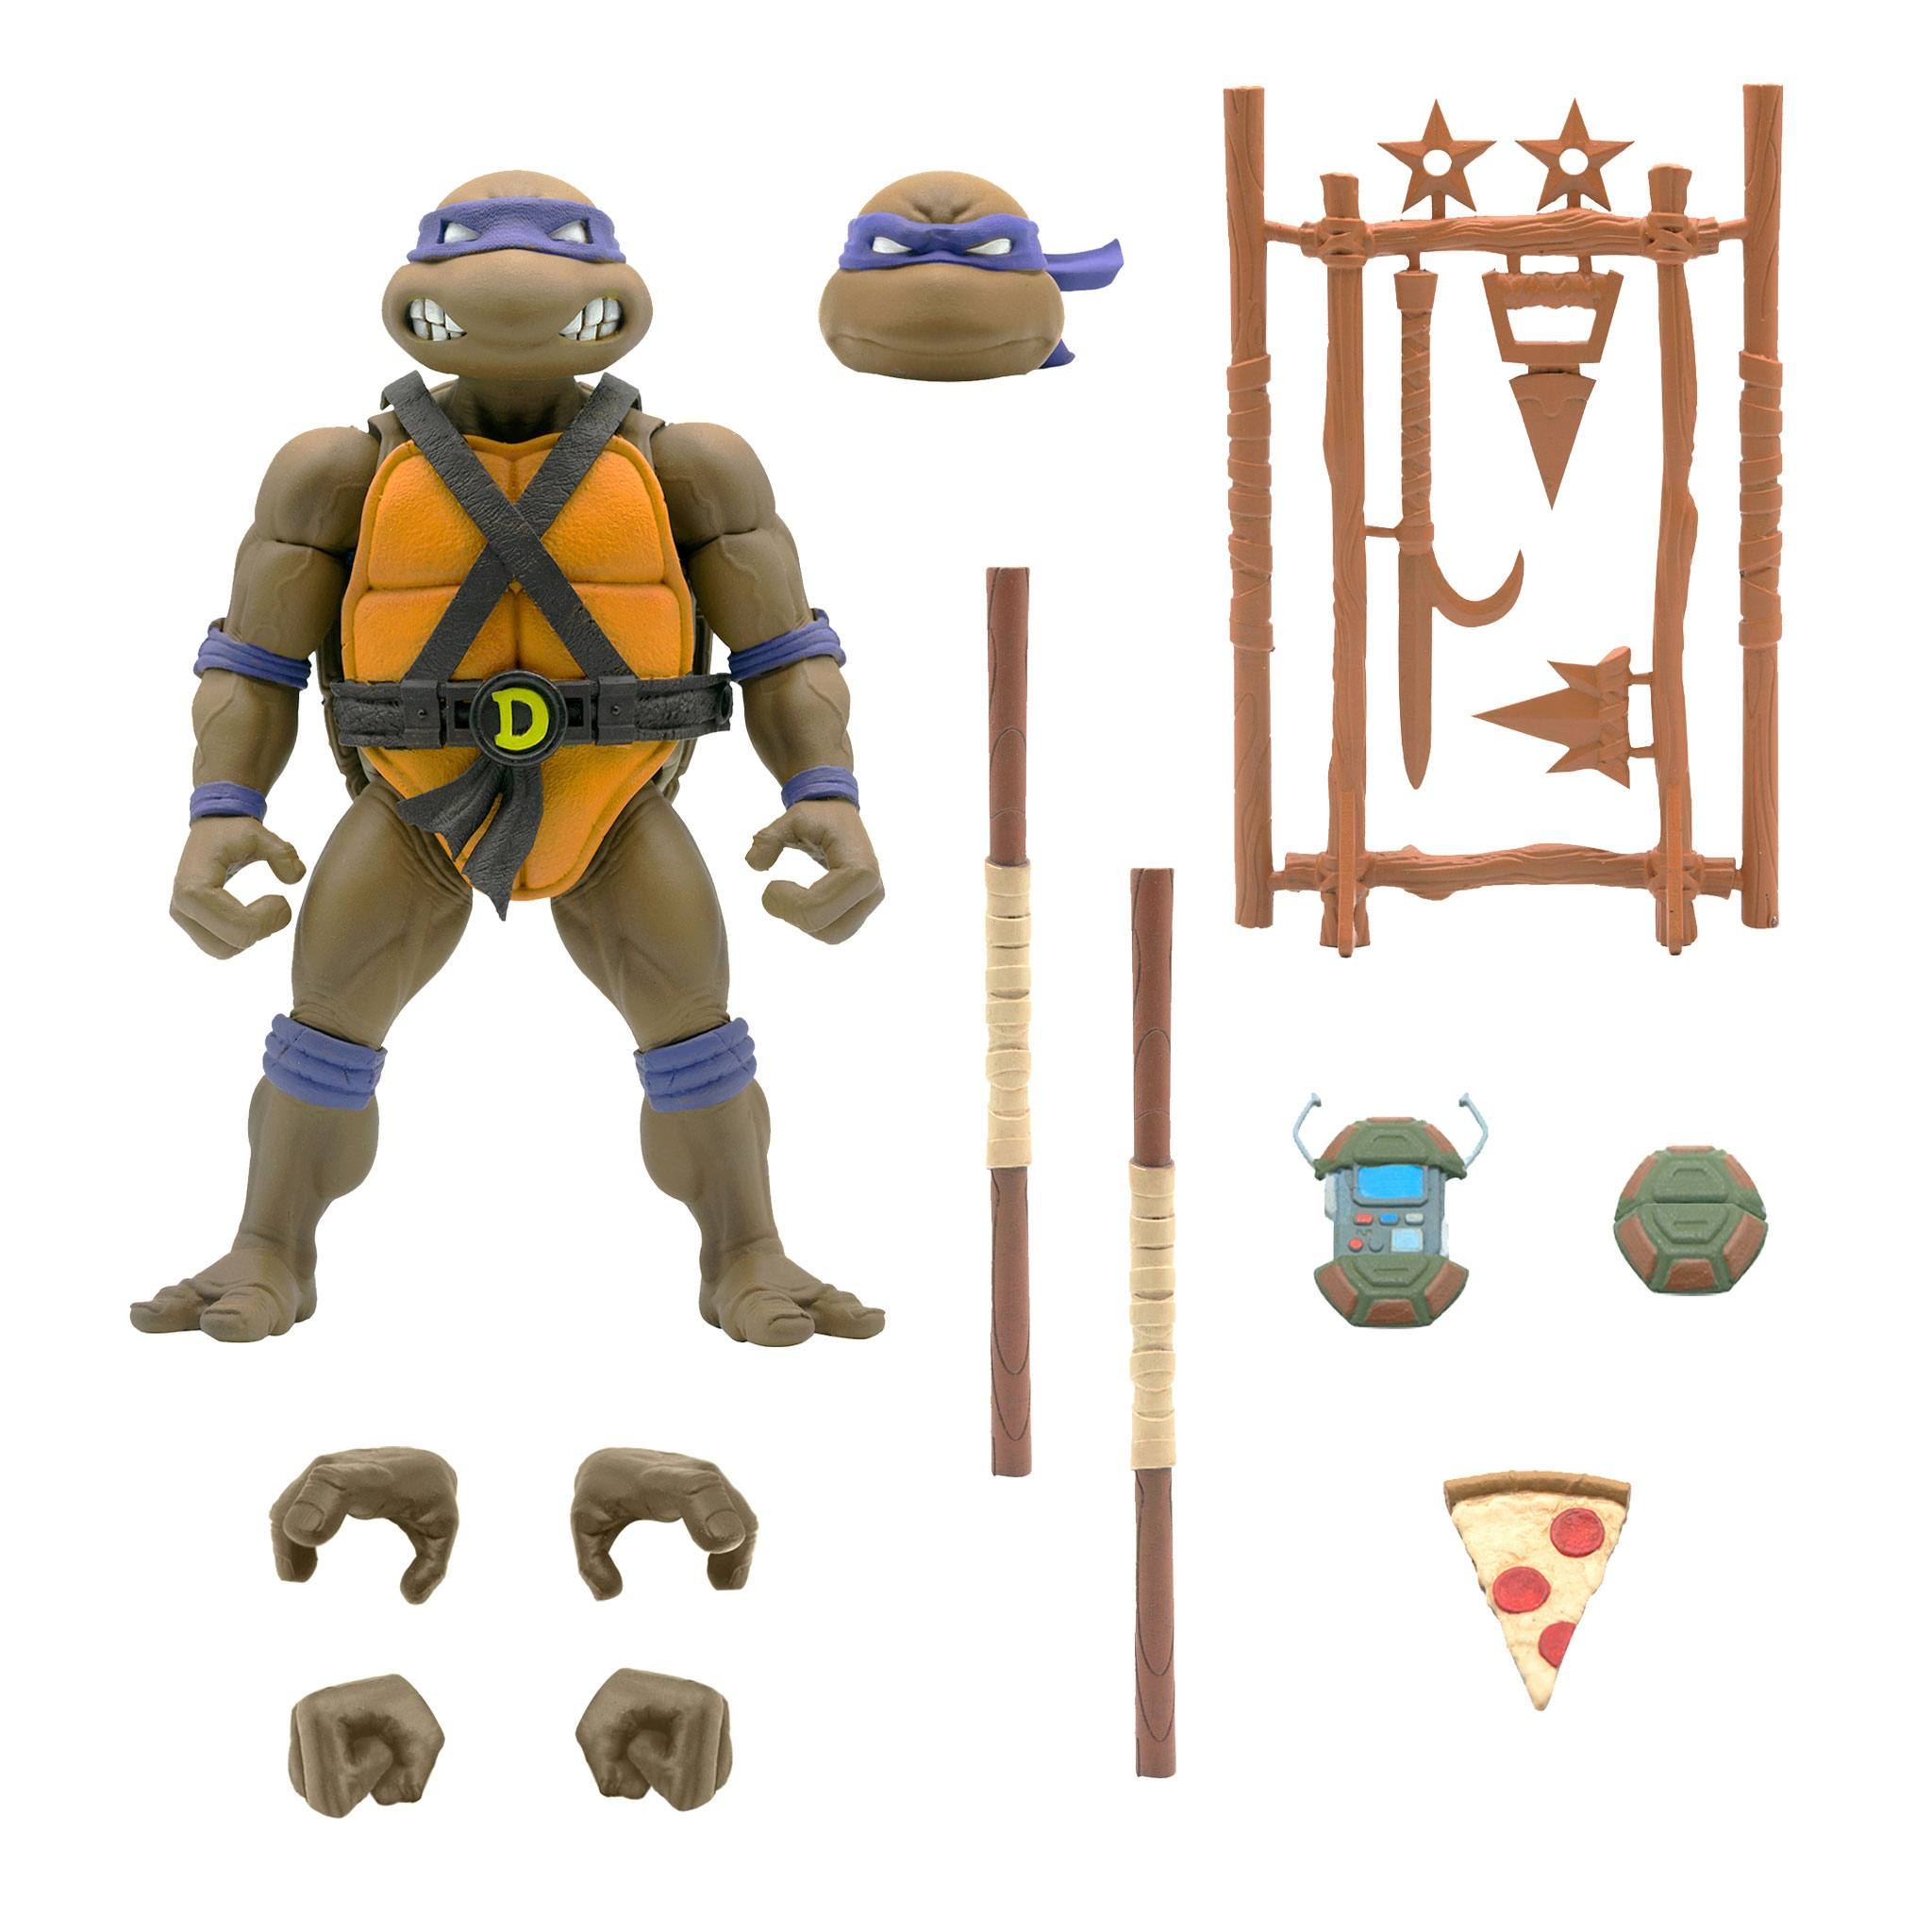 *PREORDER* Teenage Mutant Ninja Turtles: Ultimates Action Figure DONATELLO by Super 7